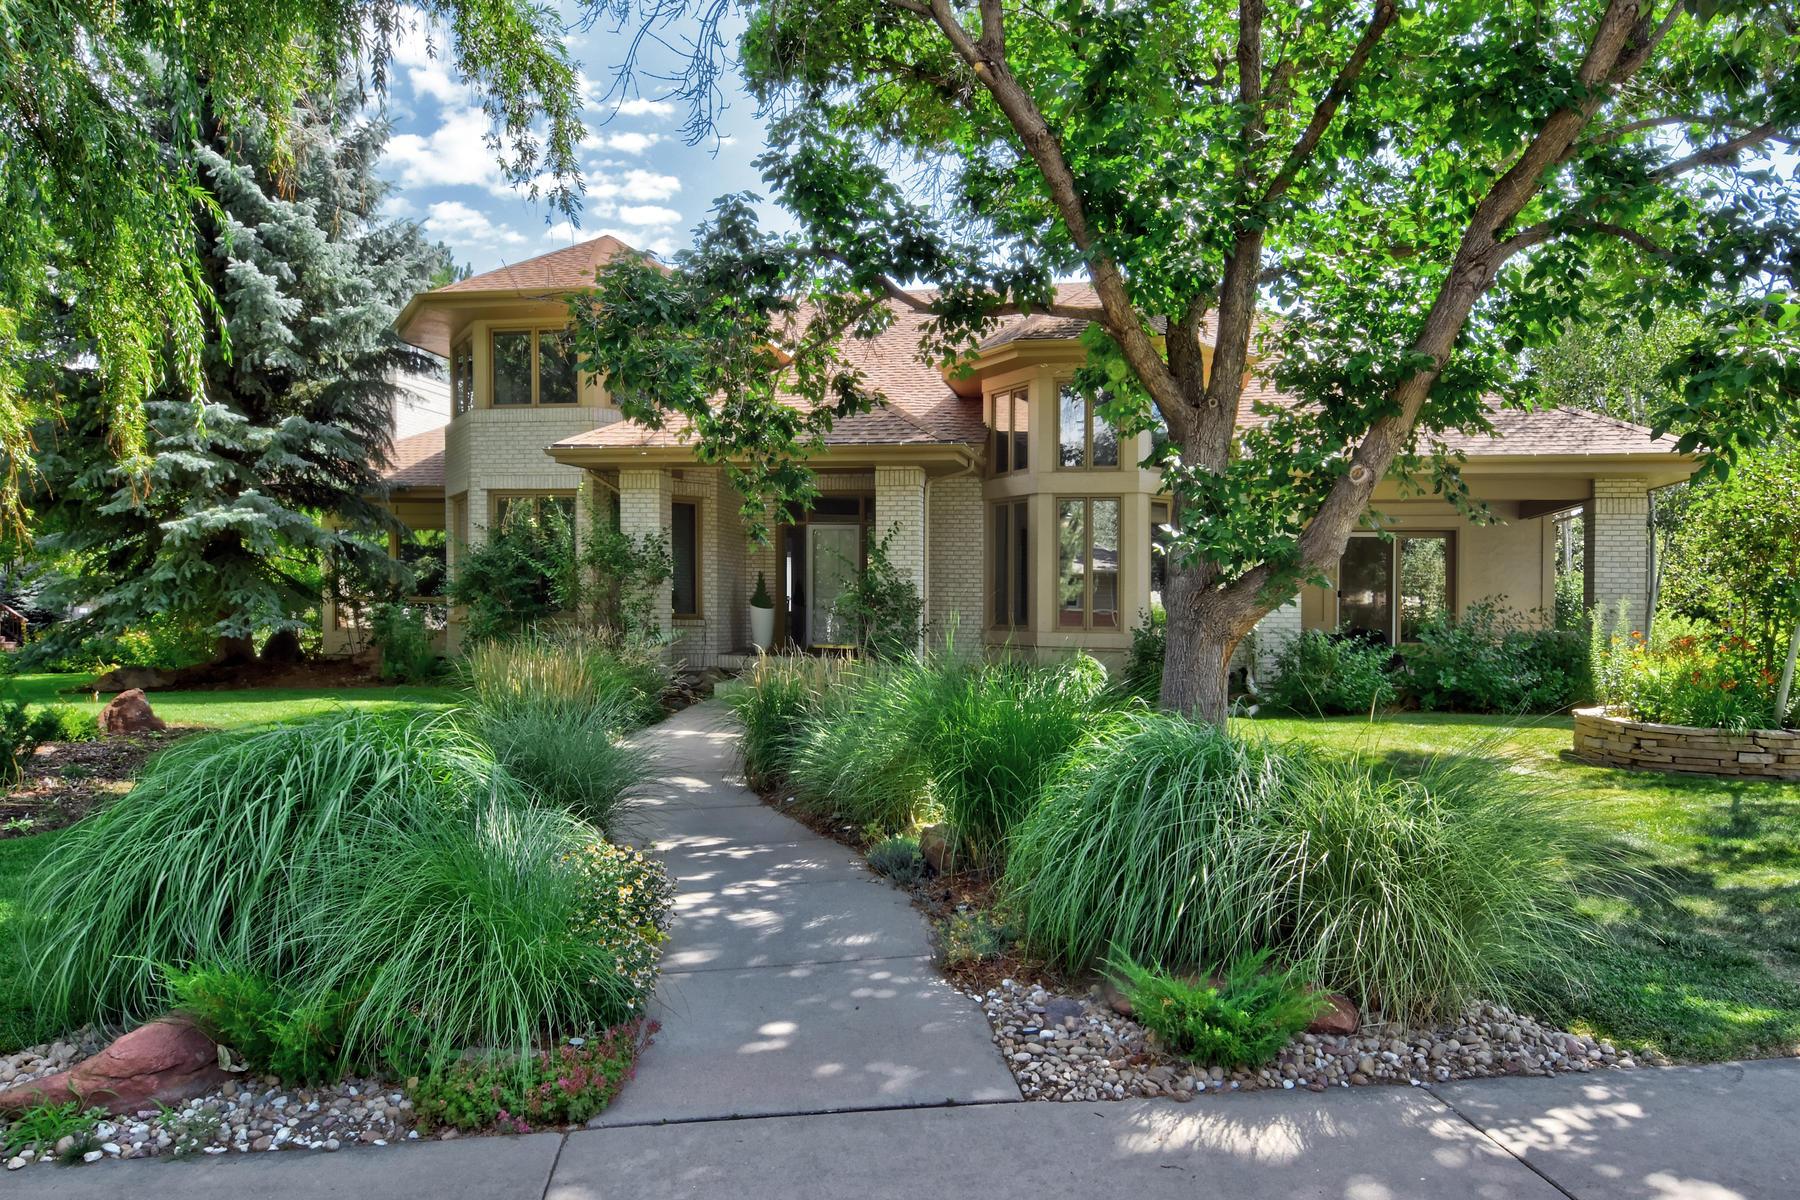 Single Family Homes για την Πώληση στο The Dream Home You've Been Waiting For 2535 Blue Heron Cir W, Lafayette, Κολοραντο 80026 Ηνωμένες Πολιτείες